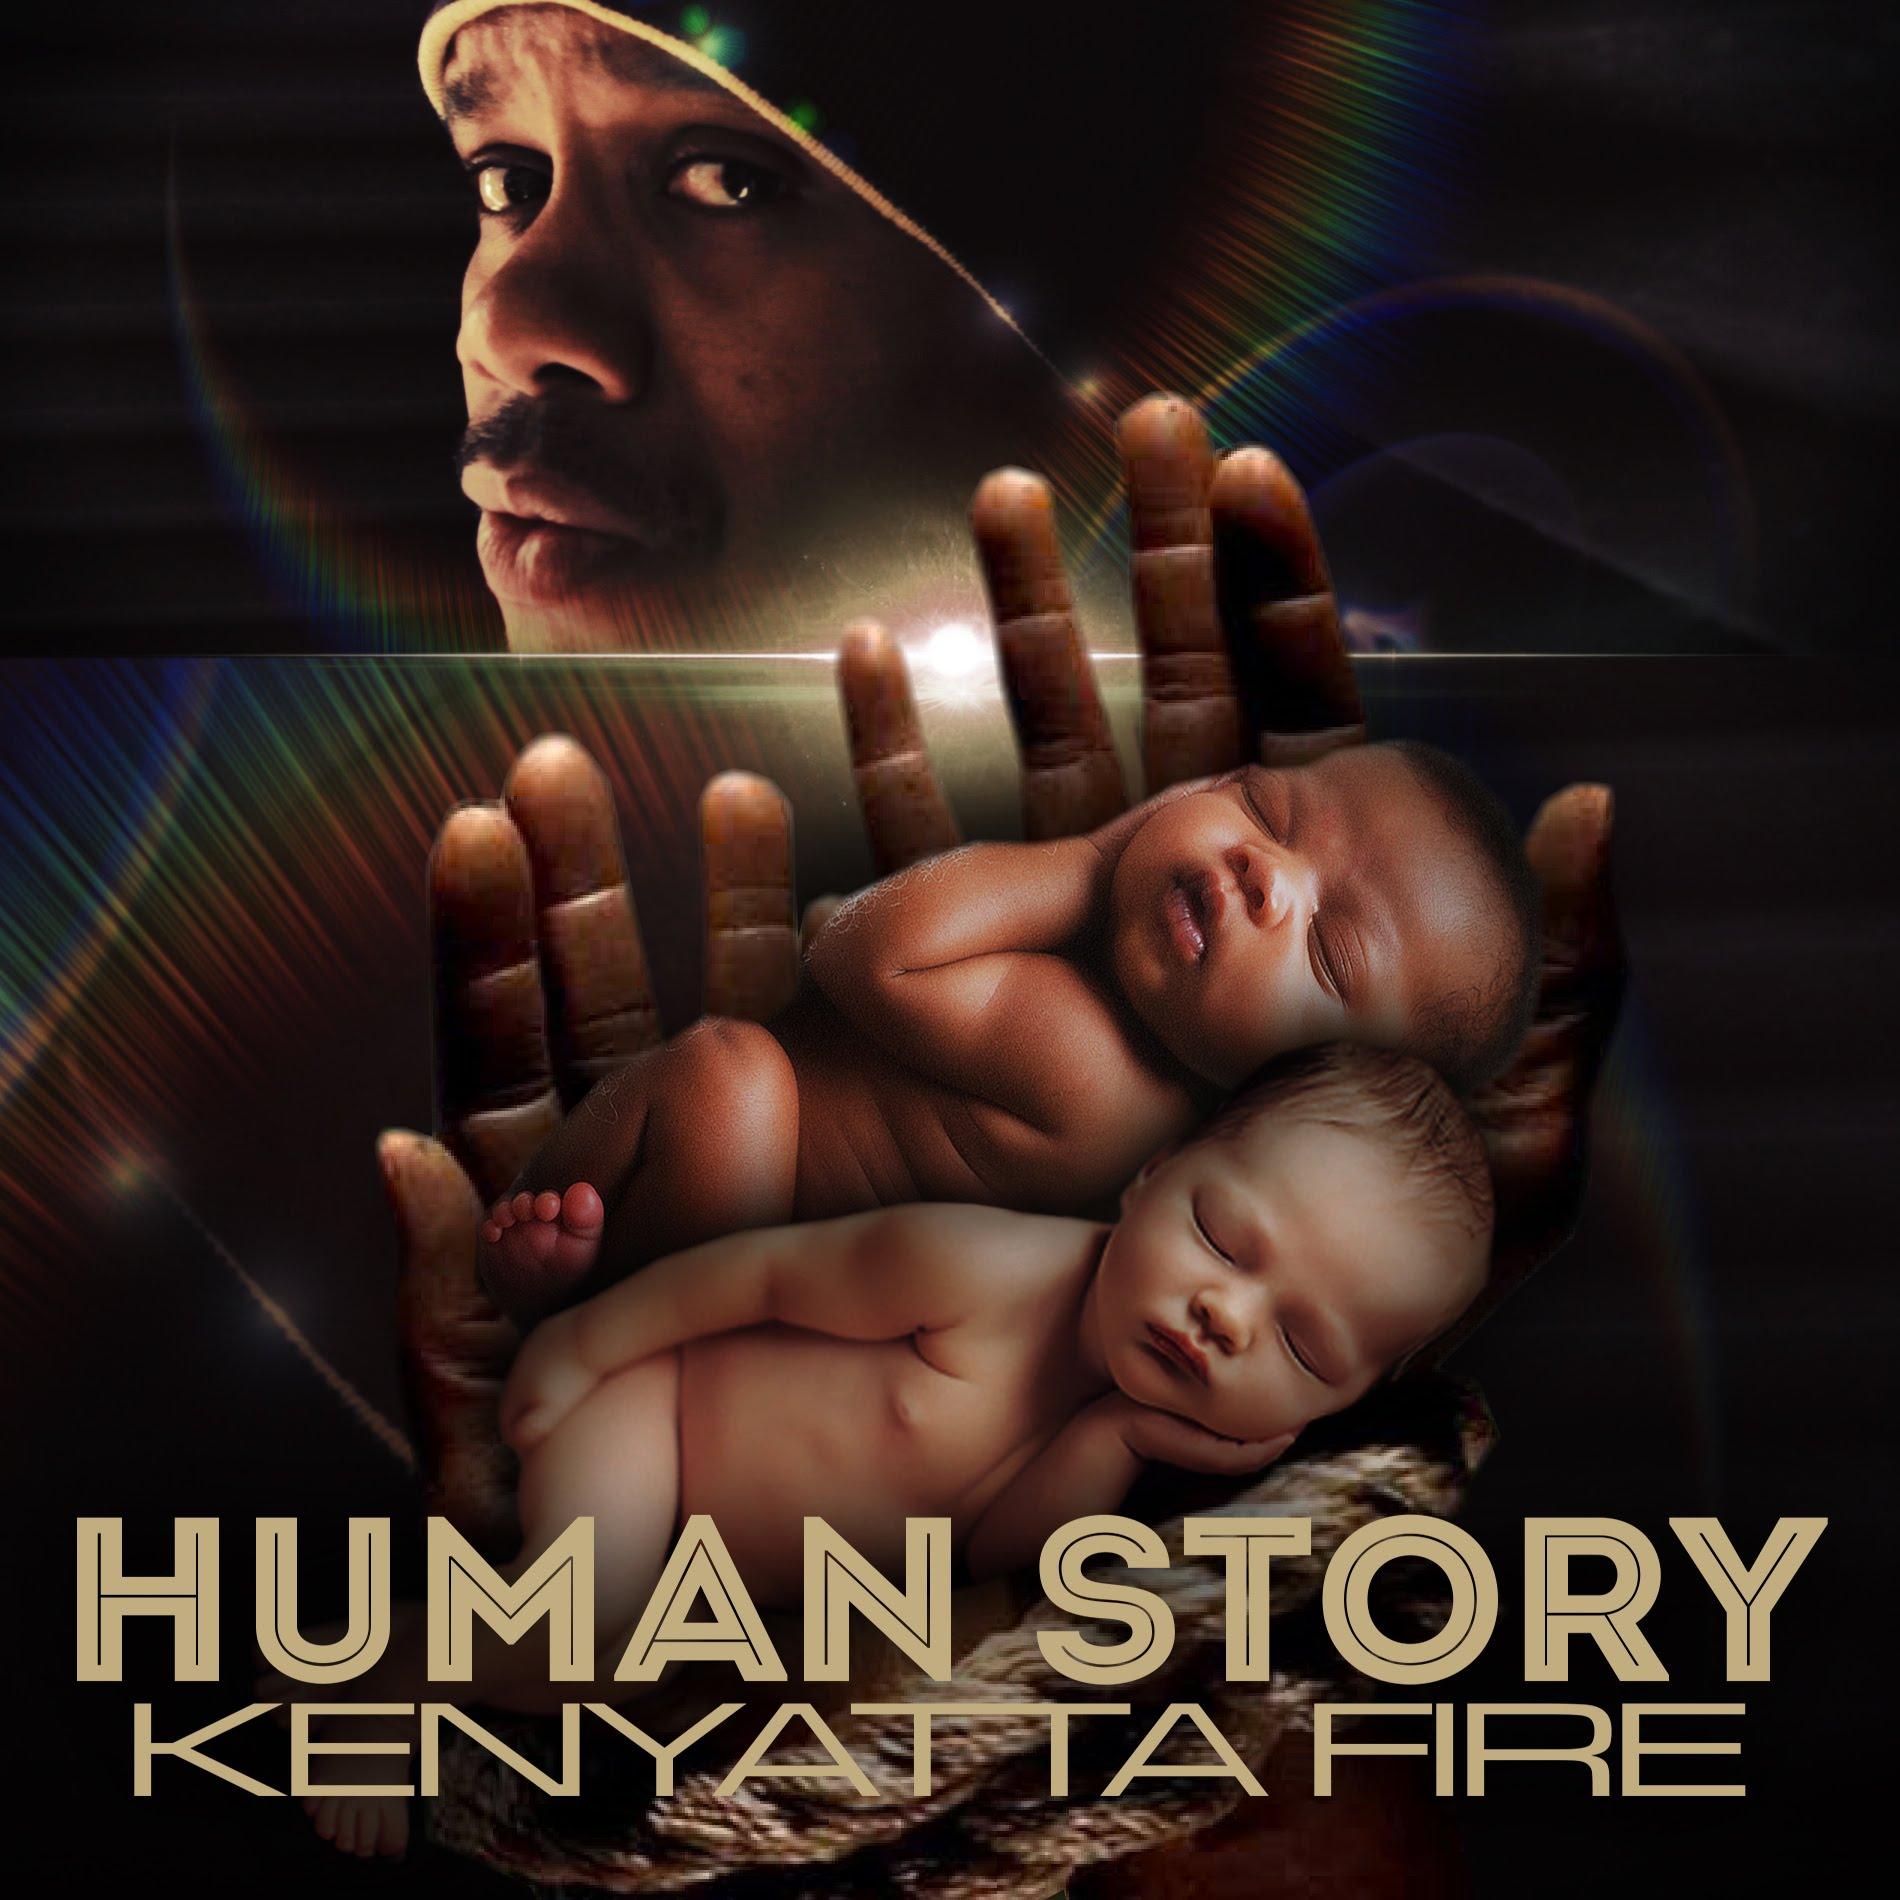 Kenyatta Fire - Human Story [10/8/2014]